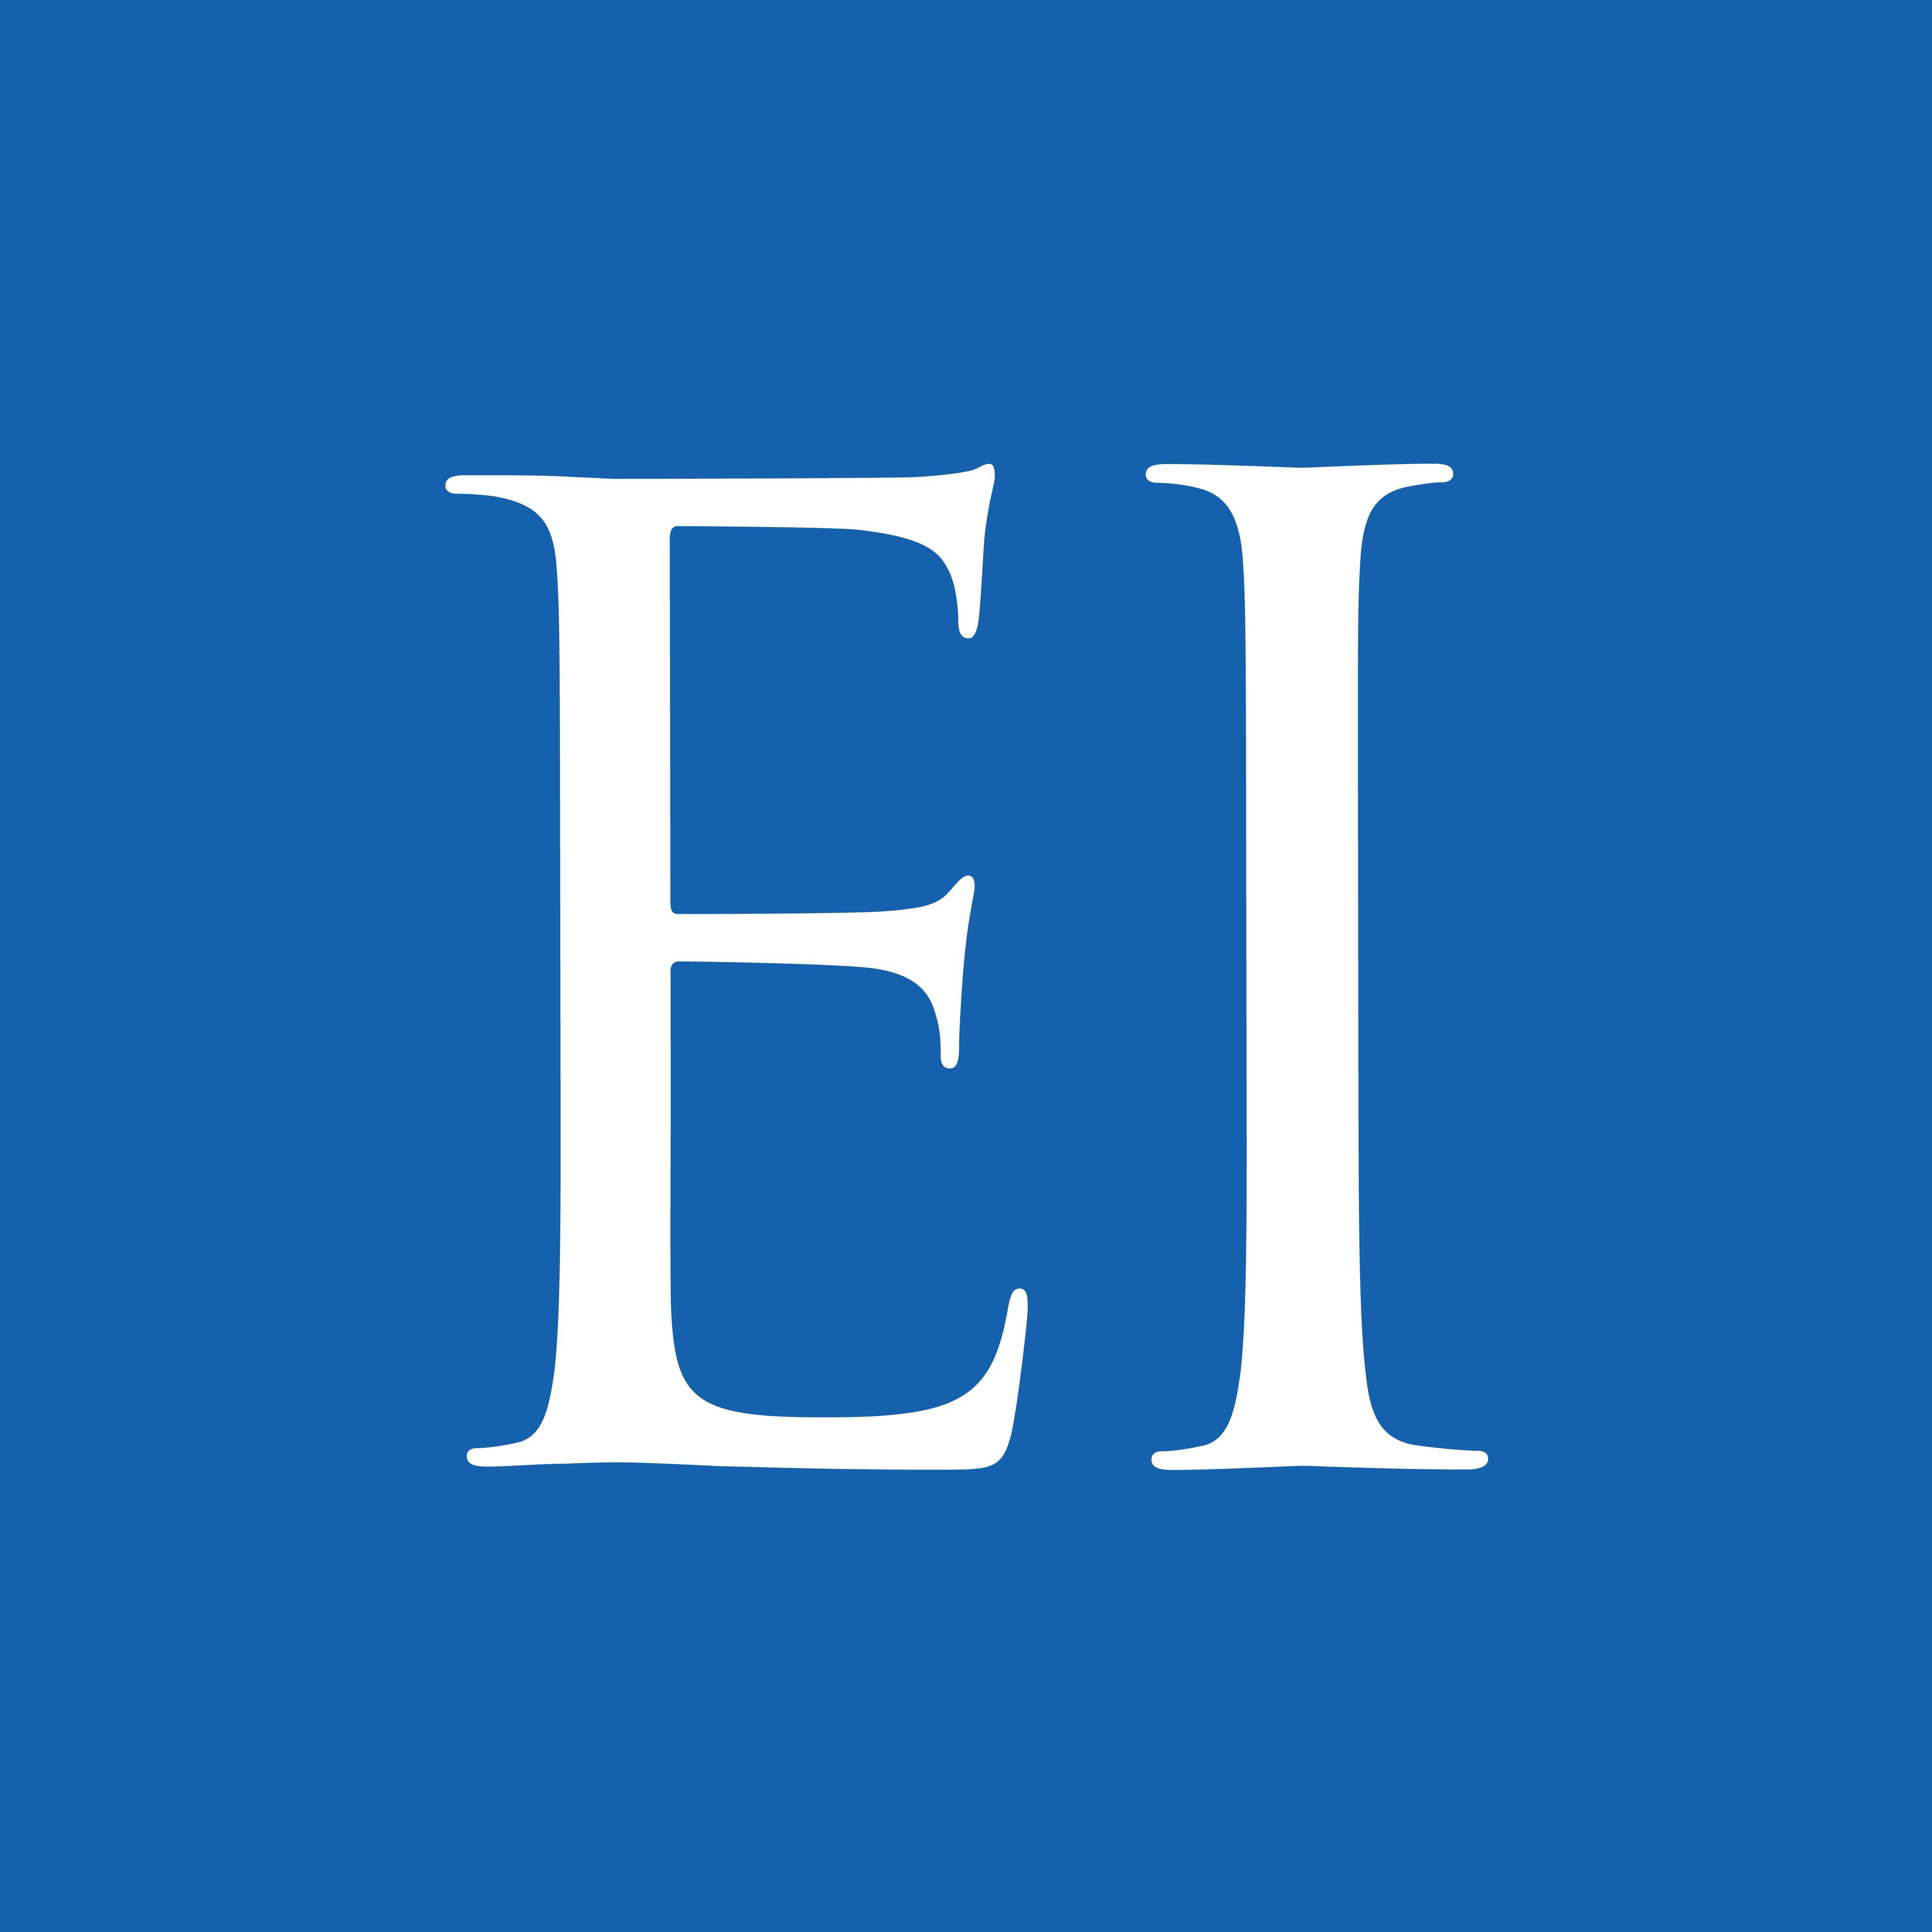 blogs.ei.columbia.edu: Earth Institute Statement on Anti-Asian Violence